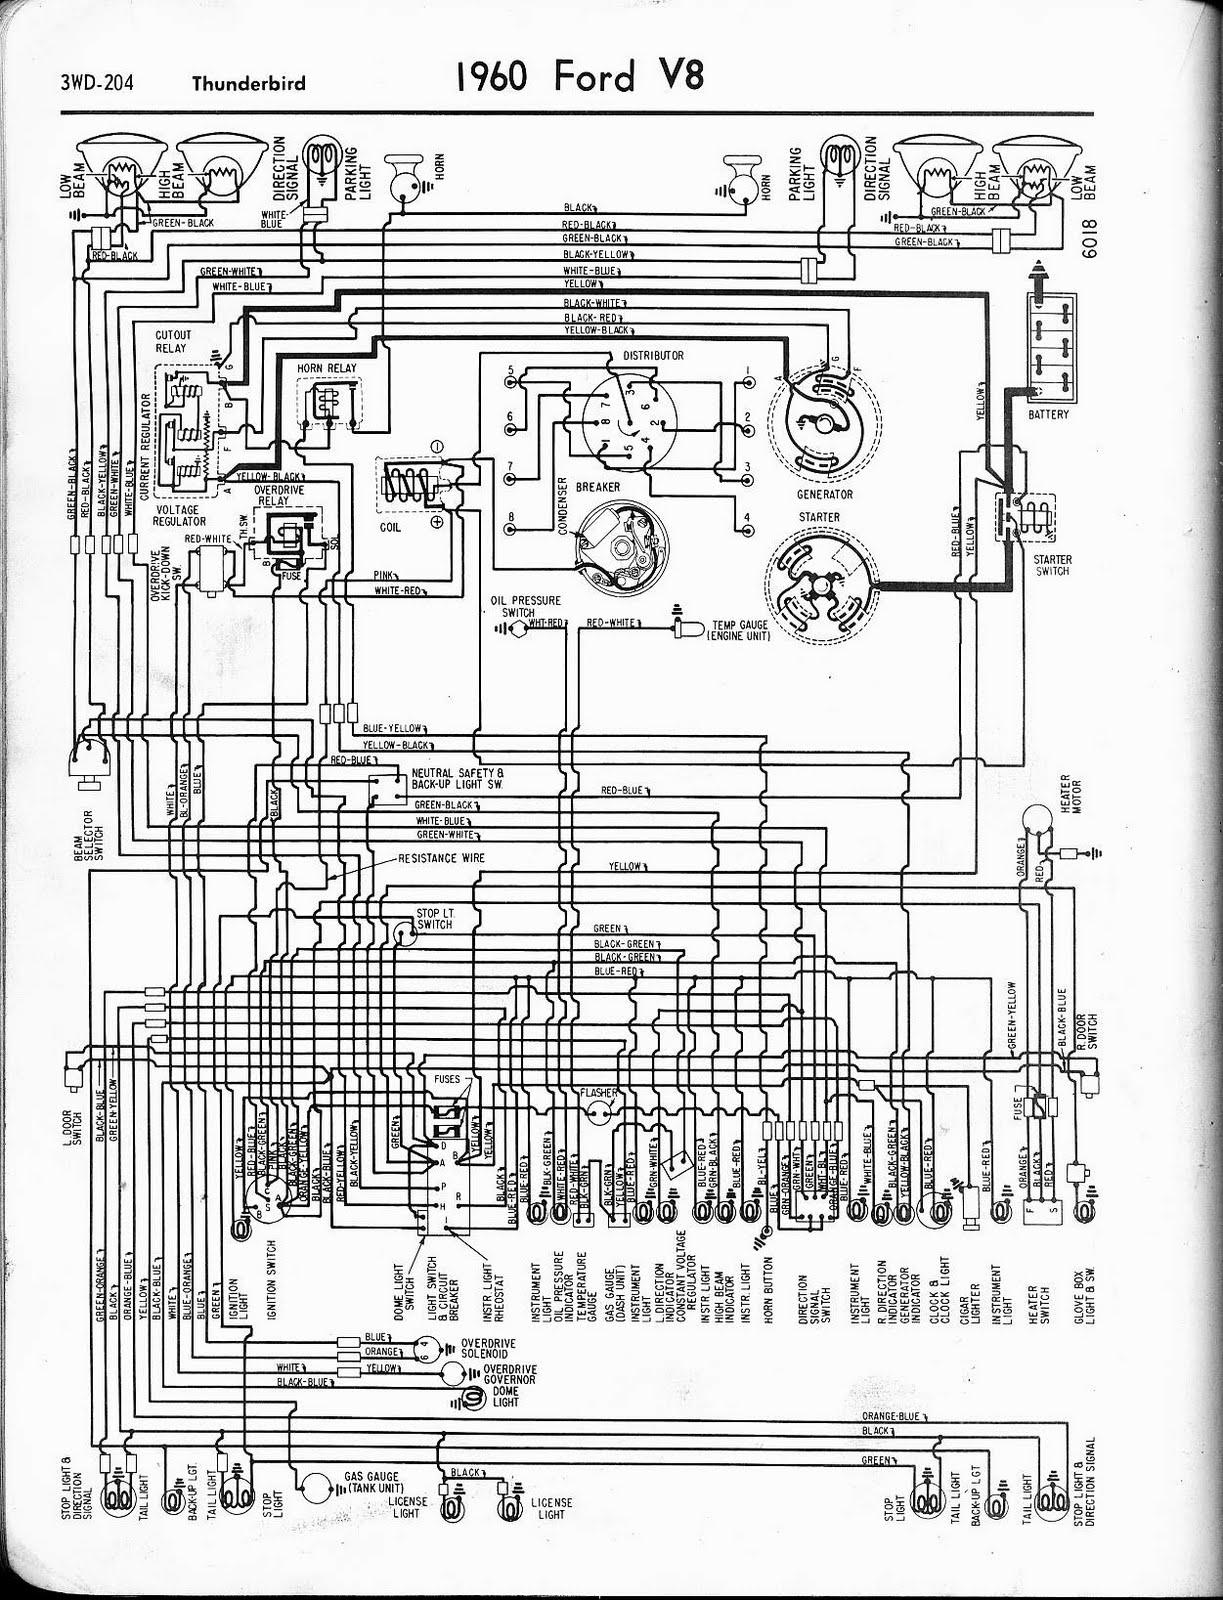 WT_2807] 1960 Thunderbird Wiring DiagramGinia Mepta Mohammedshrine Librar Wiring 101